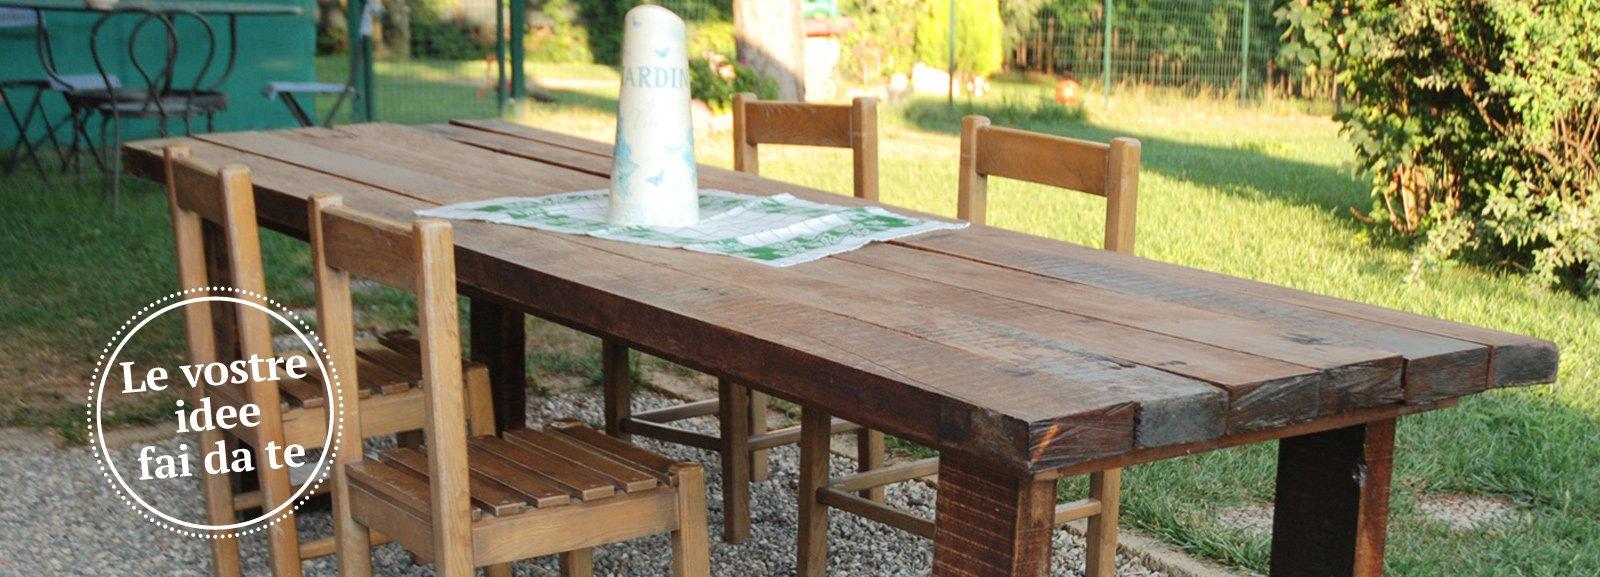 Bricolage legno idee gallery of with bricolage legno idee - Bricolage legno idee ...